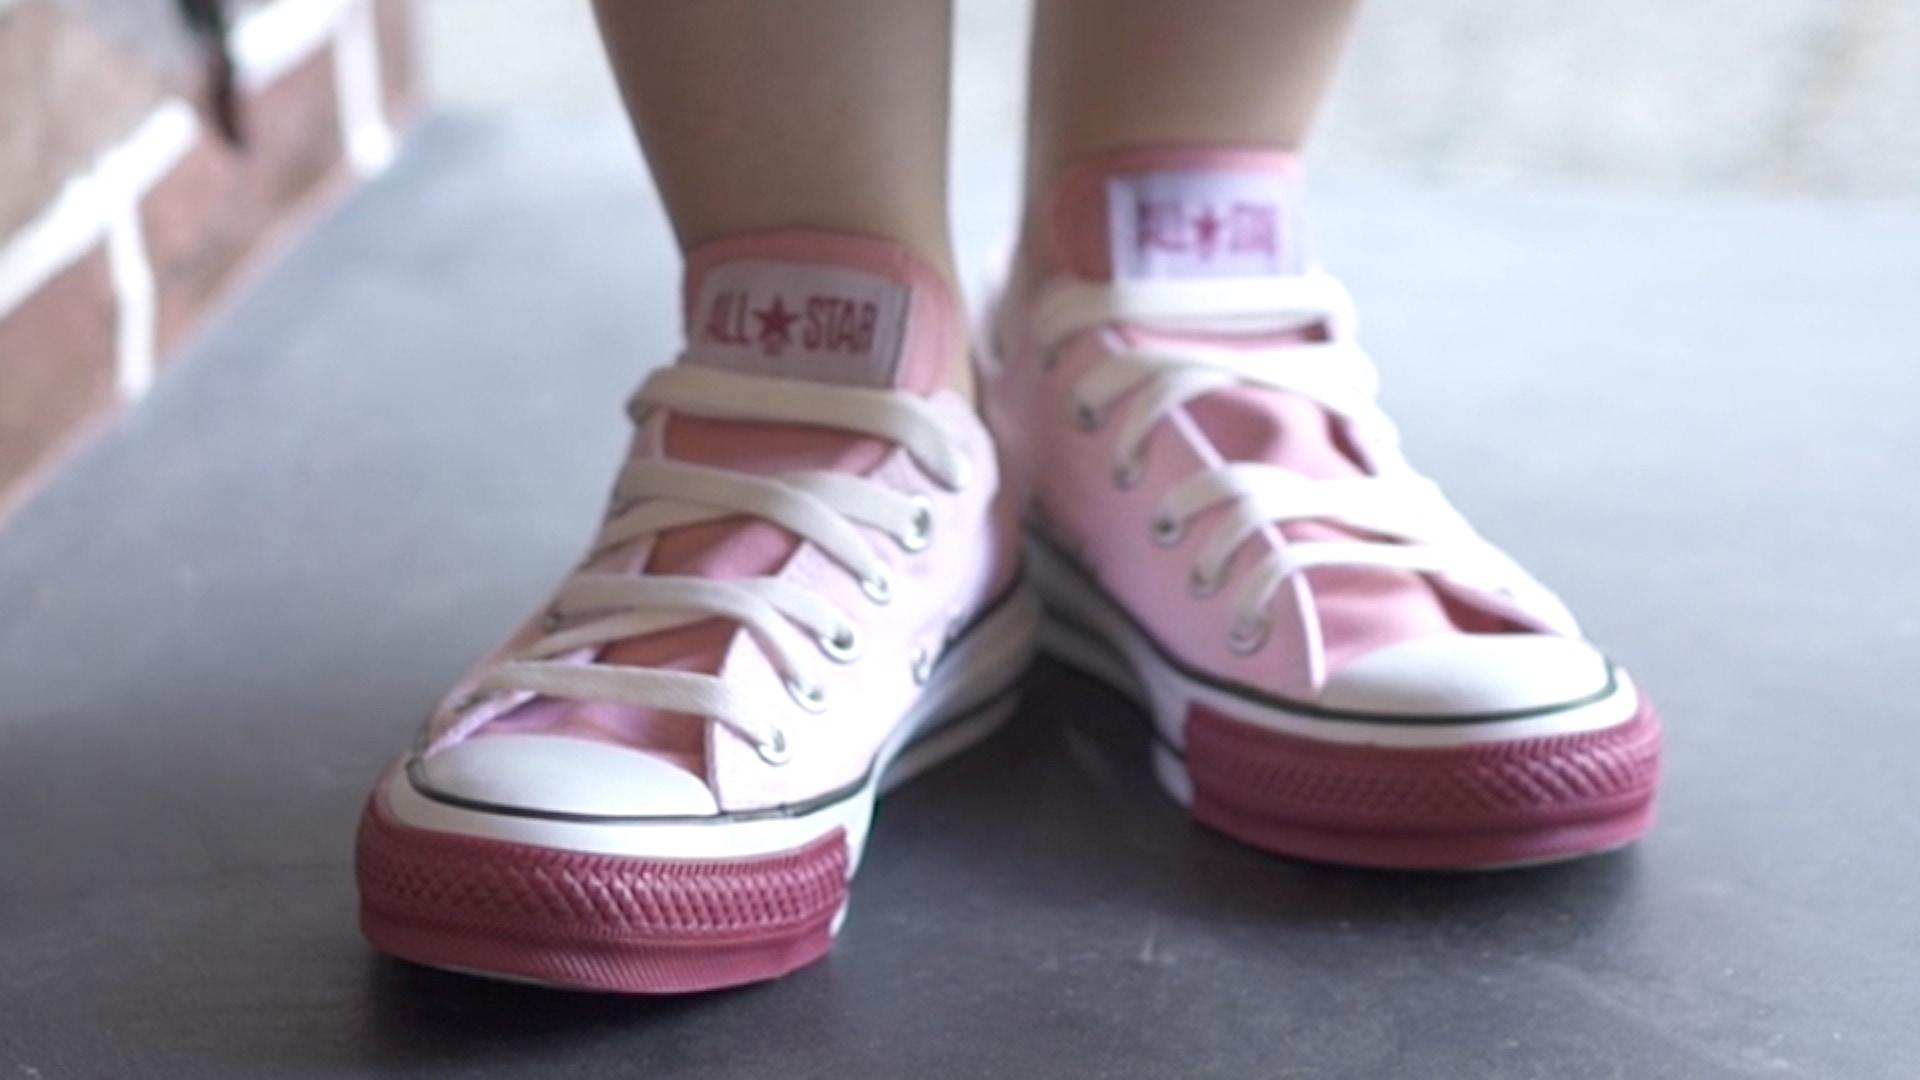 【DIY】CONVERSEの靴紐の結び方アレンジ #5